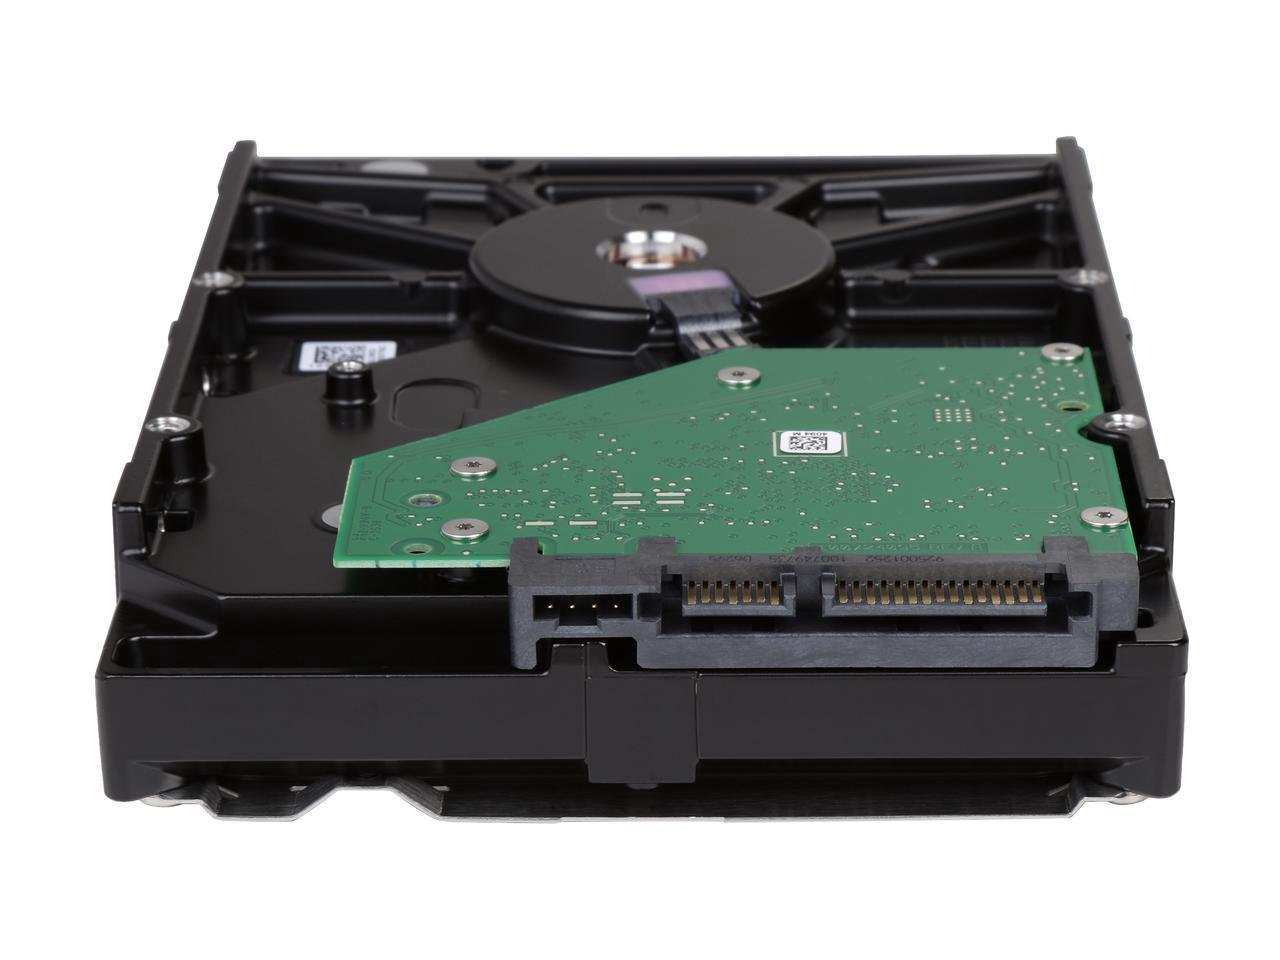 Хард диск SEAGATE SkyHawk ST2000VX008, 2TB, 64MB Cache, SATA 6.0Gb/s-4